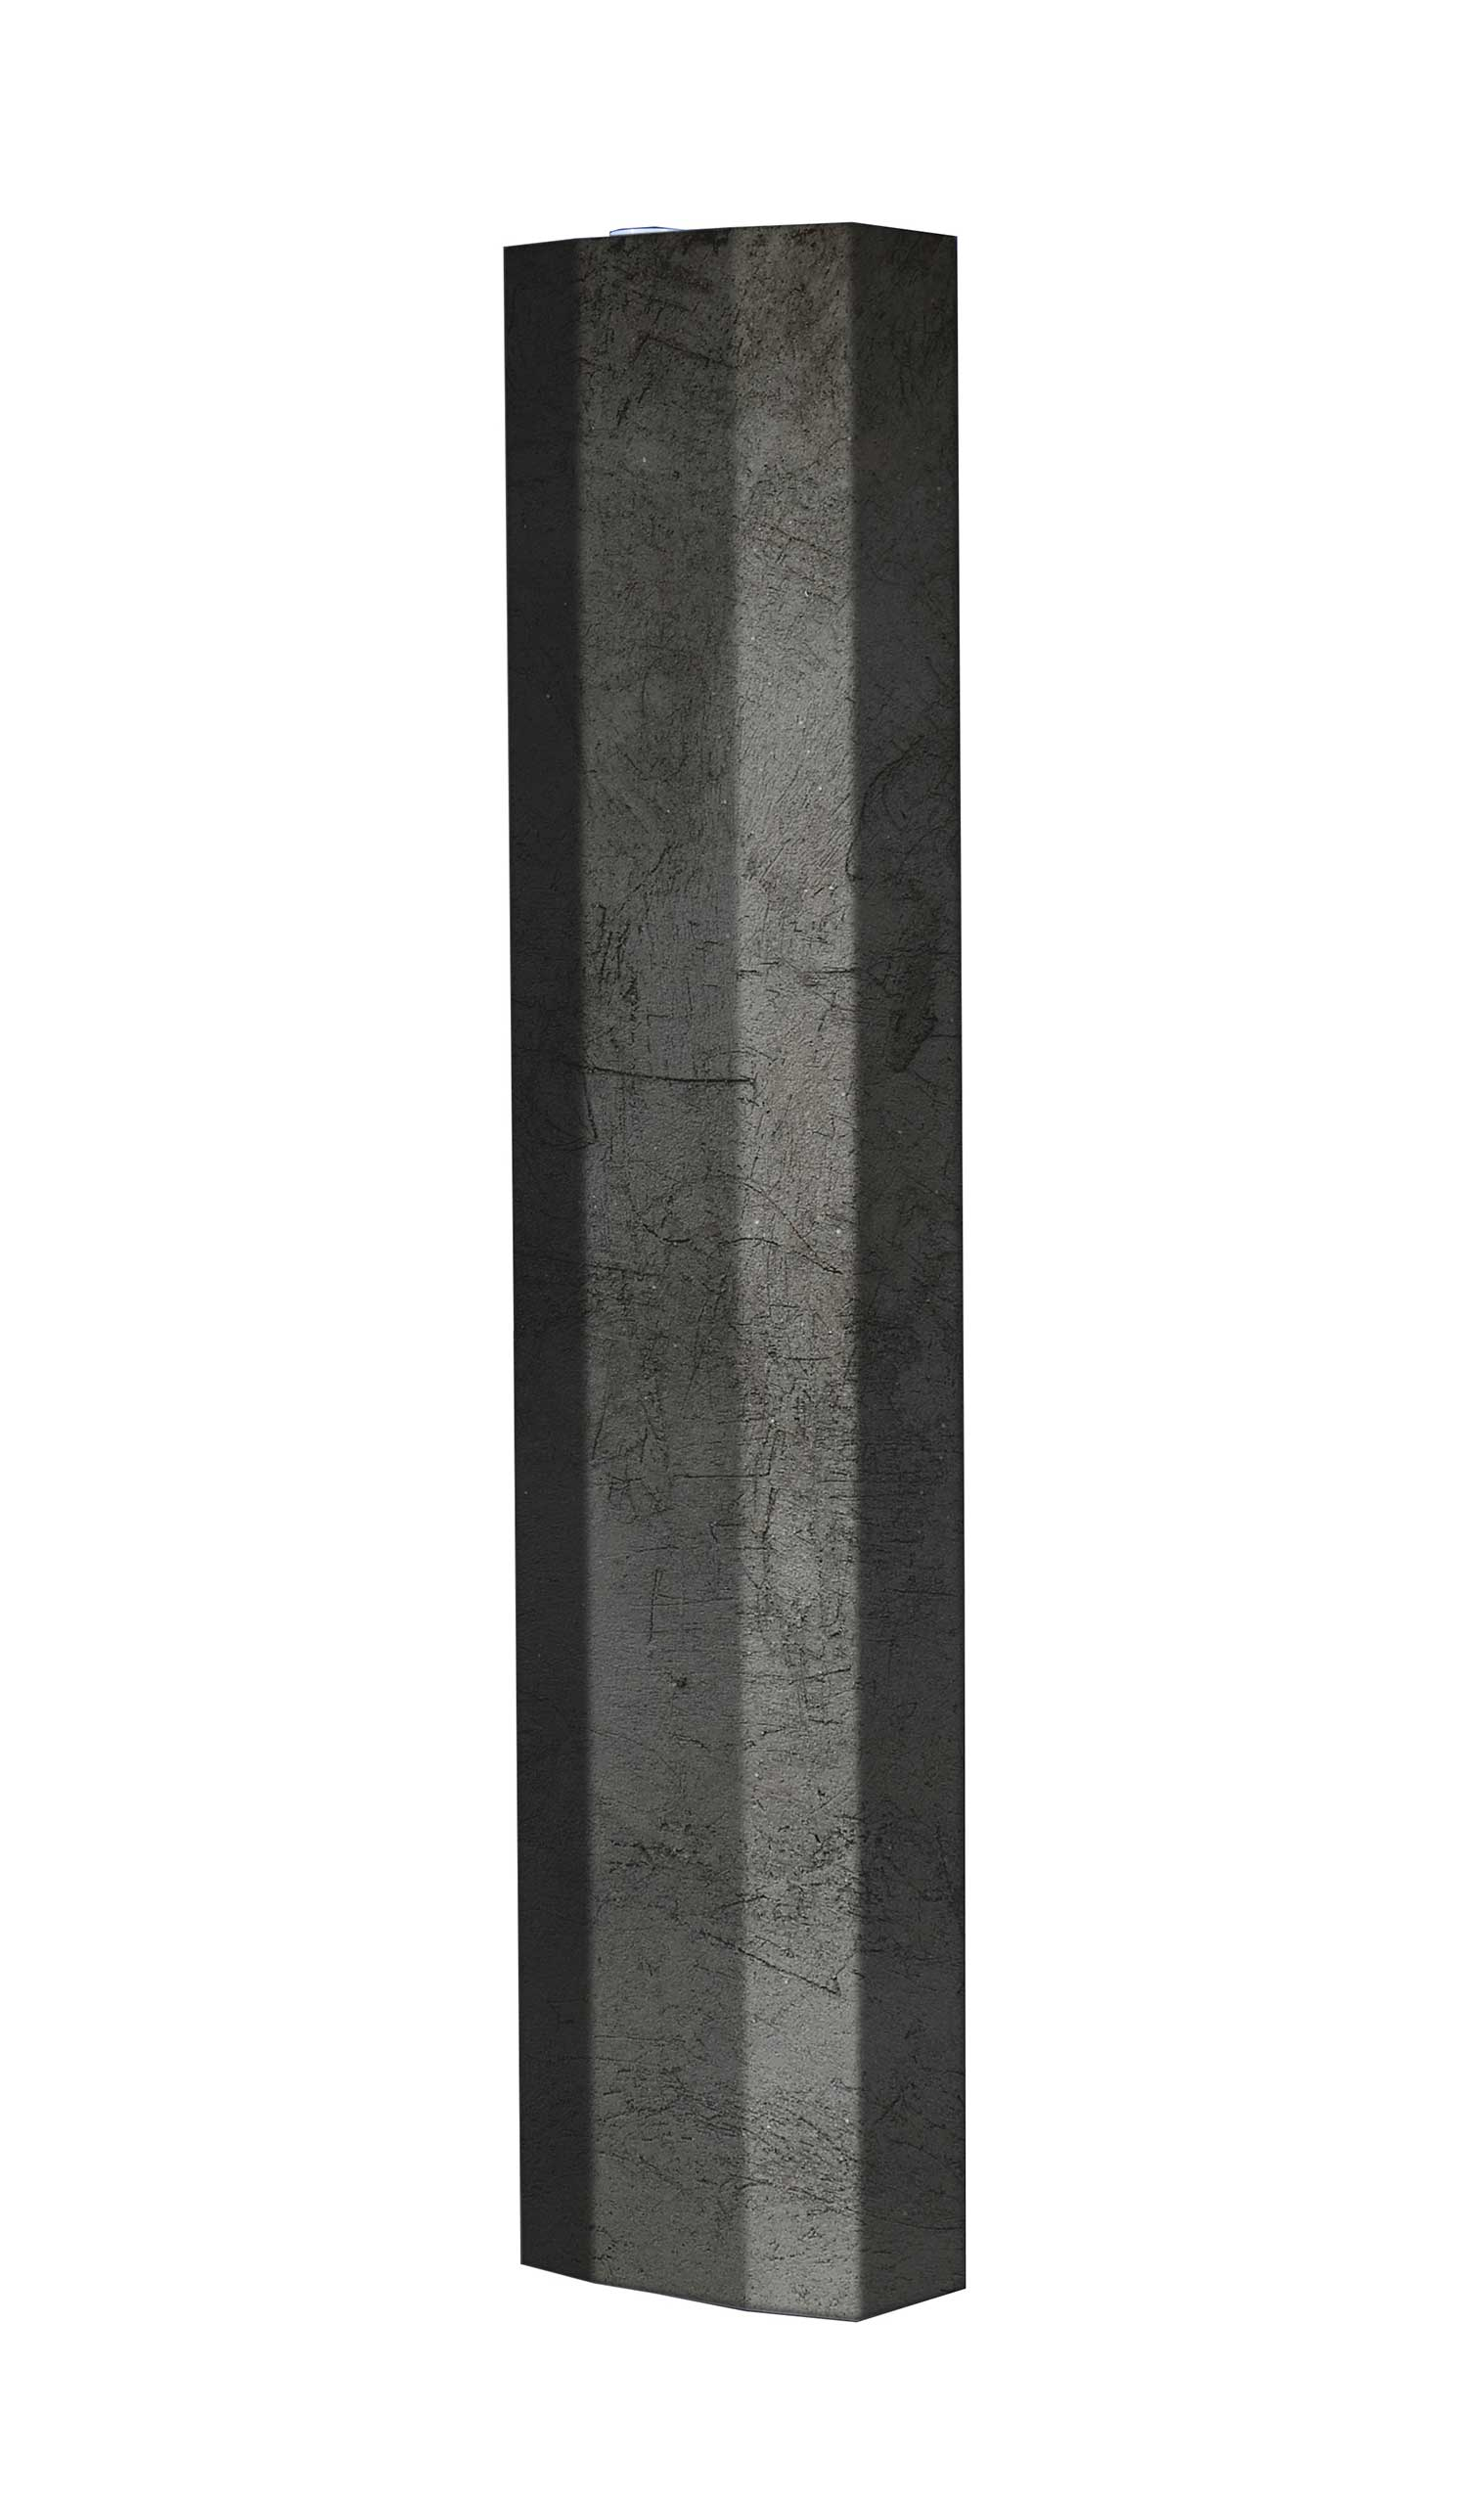 Schuhschrank STORM Motivschrank Single S110 Schiefer weiß